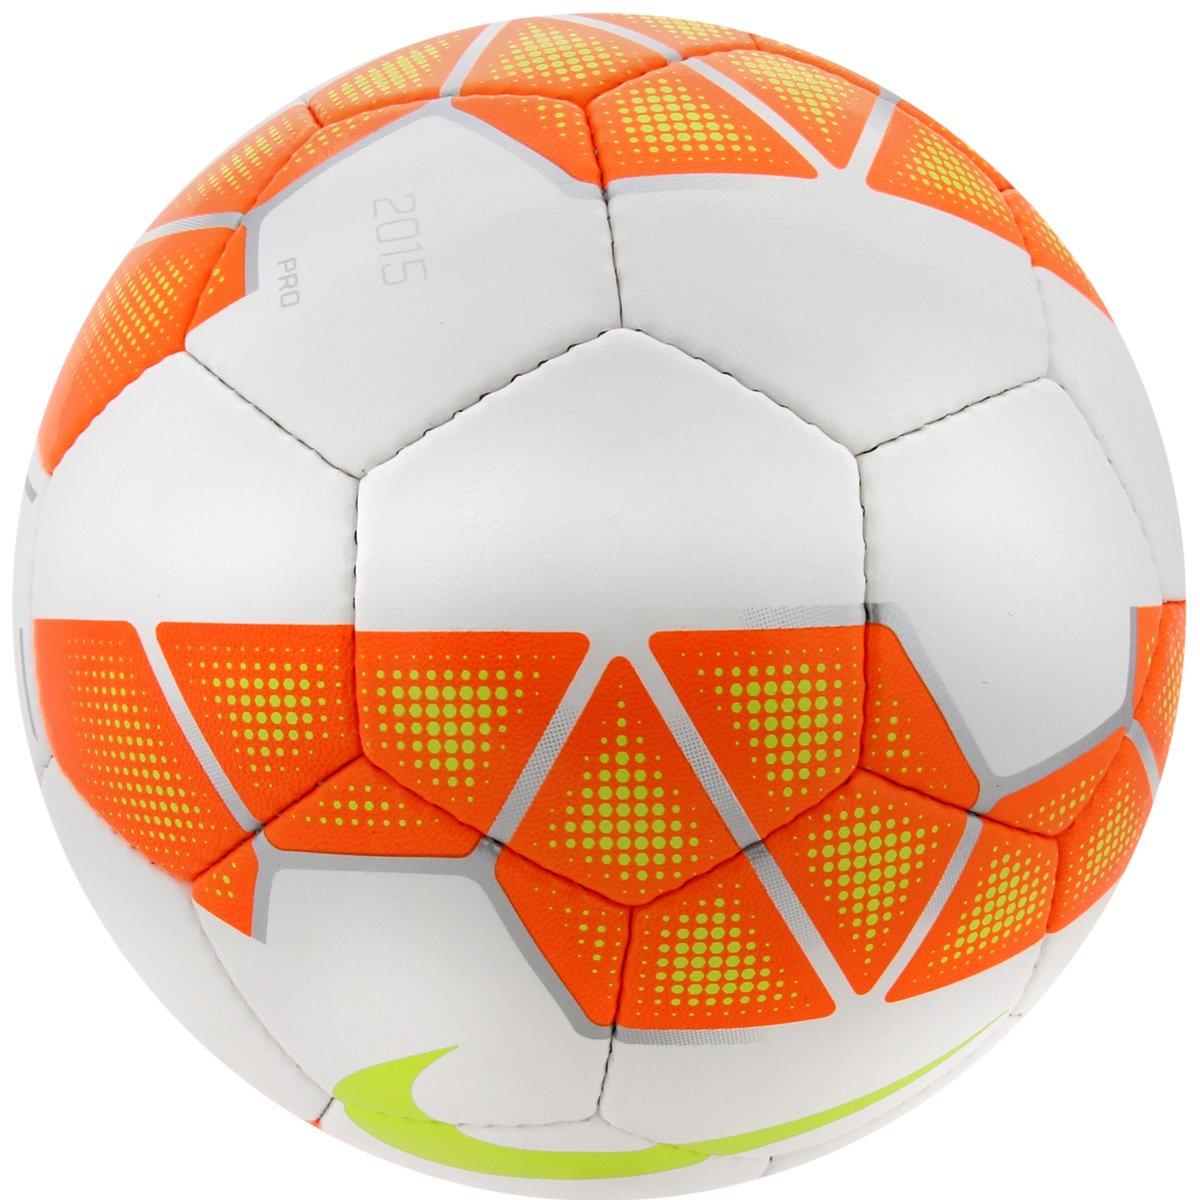 8fc48ae80a Bola Nike Rolinho Premier CSF Futsal - Compre Agora